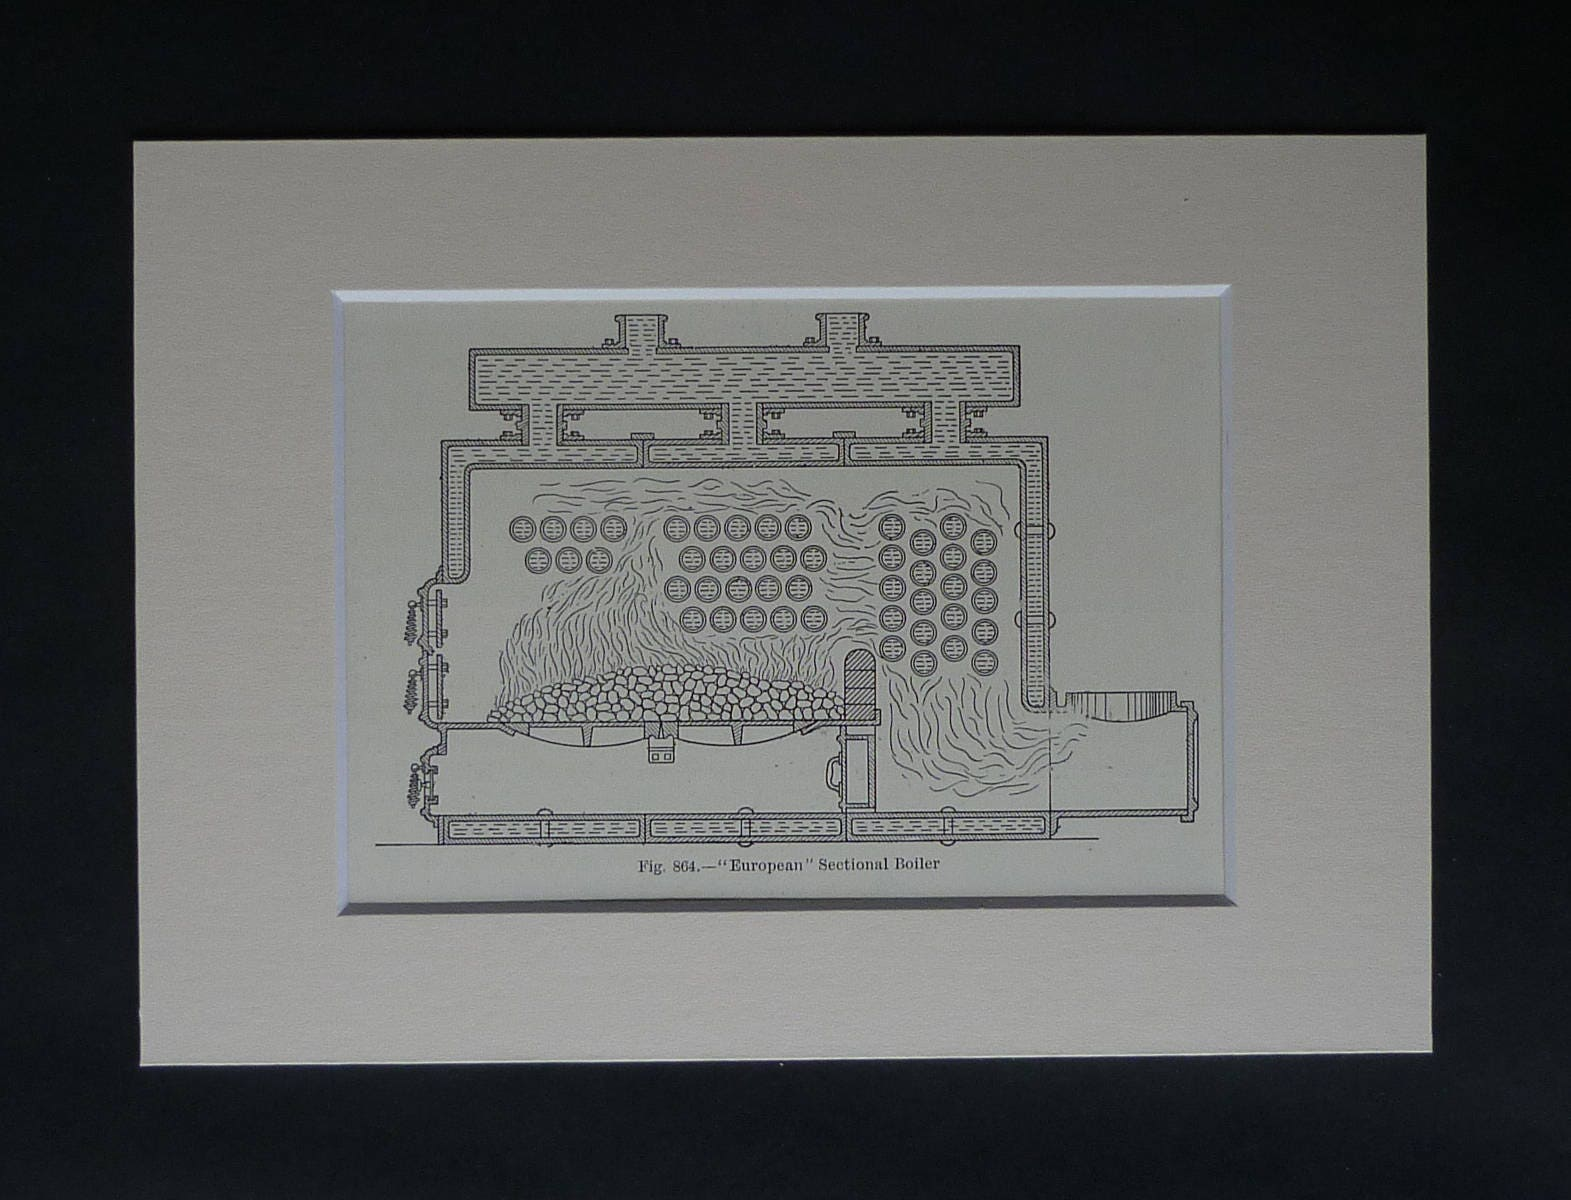 1907 Antique Plumbing Print of a European Section Boiler